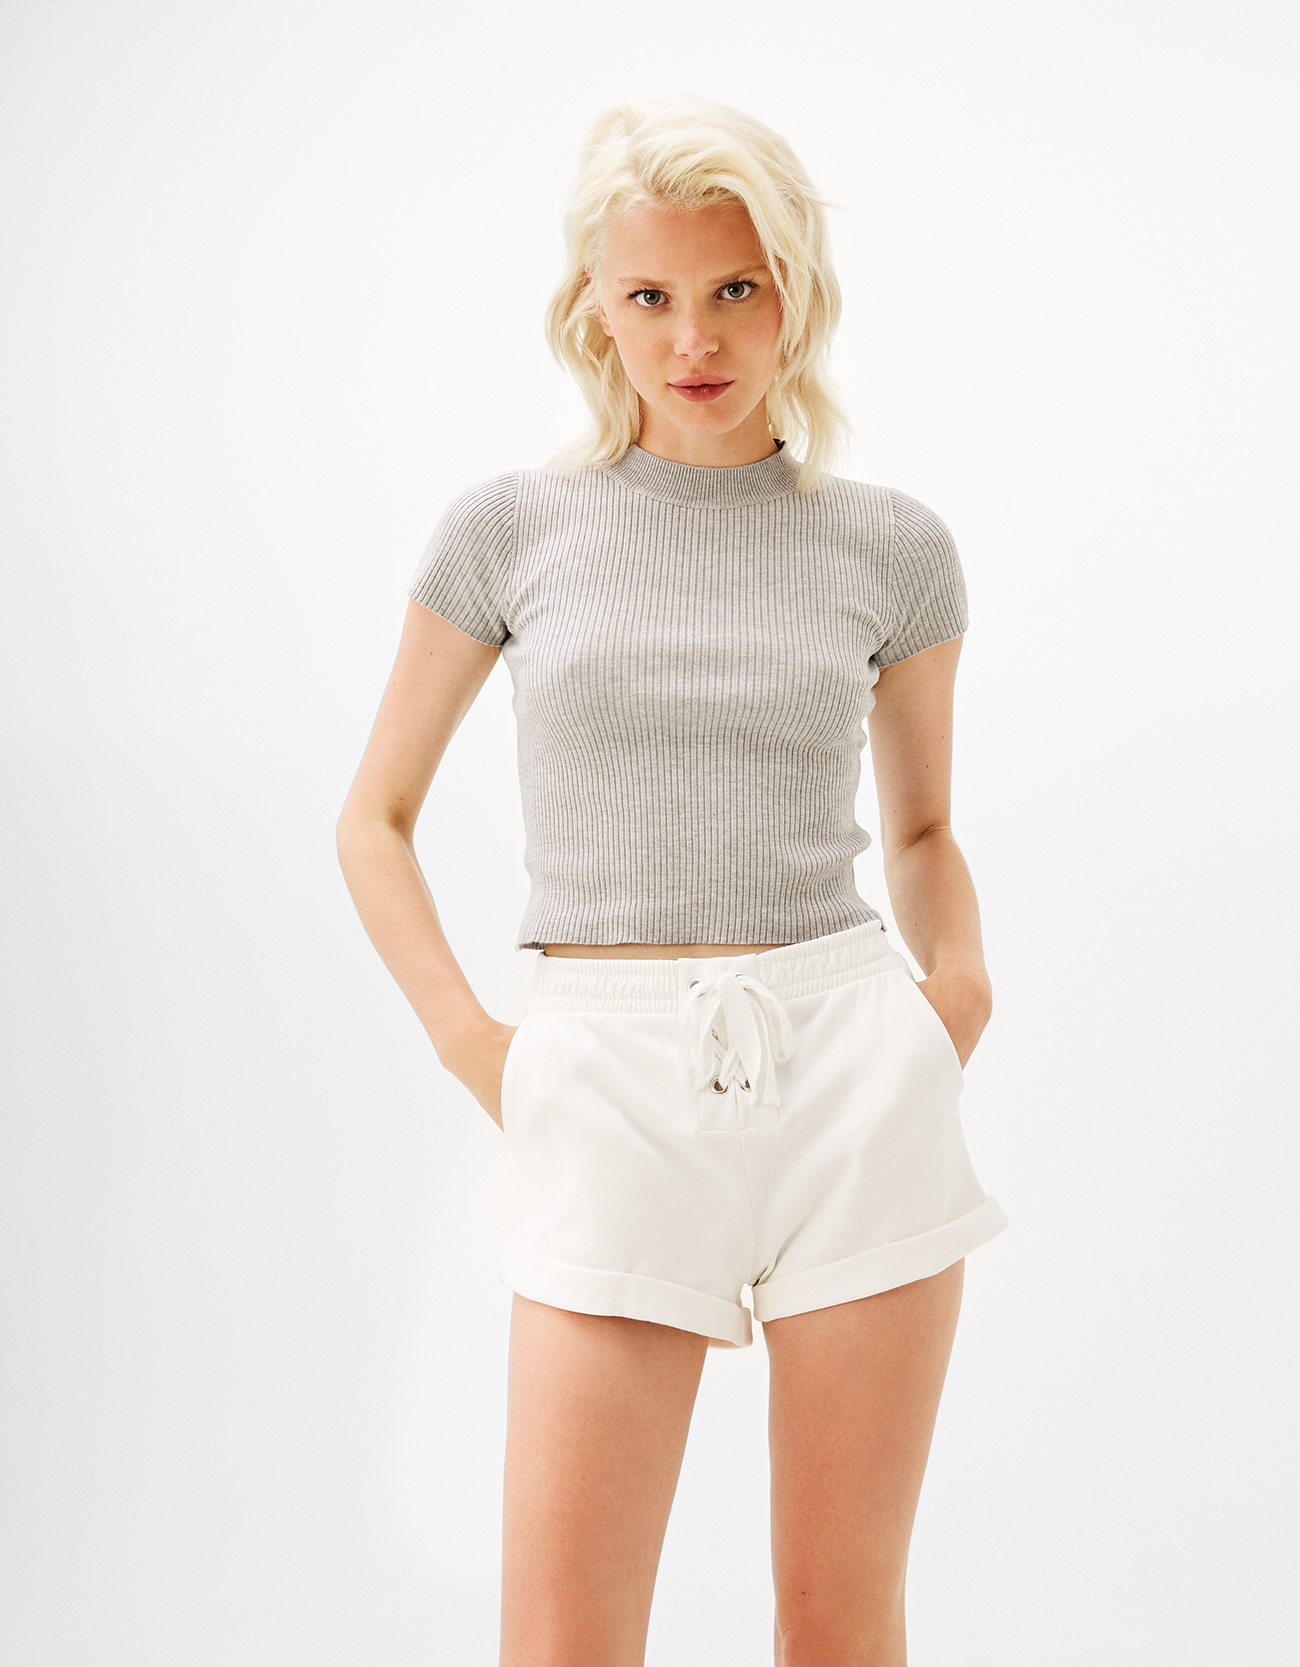 Short sleeve sweater with choker neck in back - null - Bershka Georgia